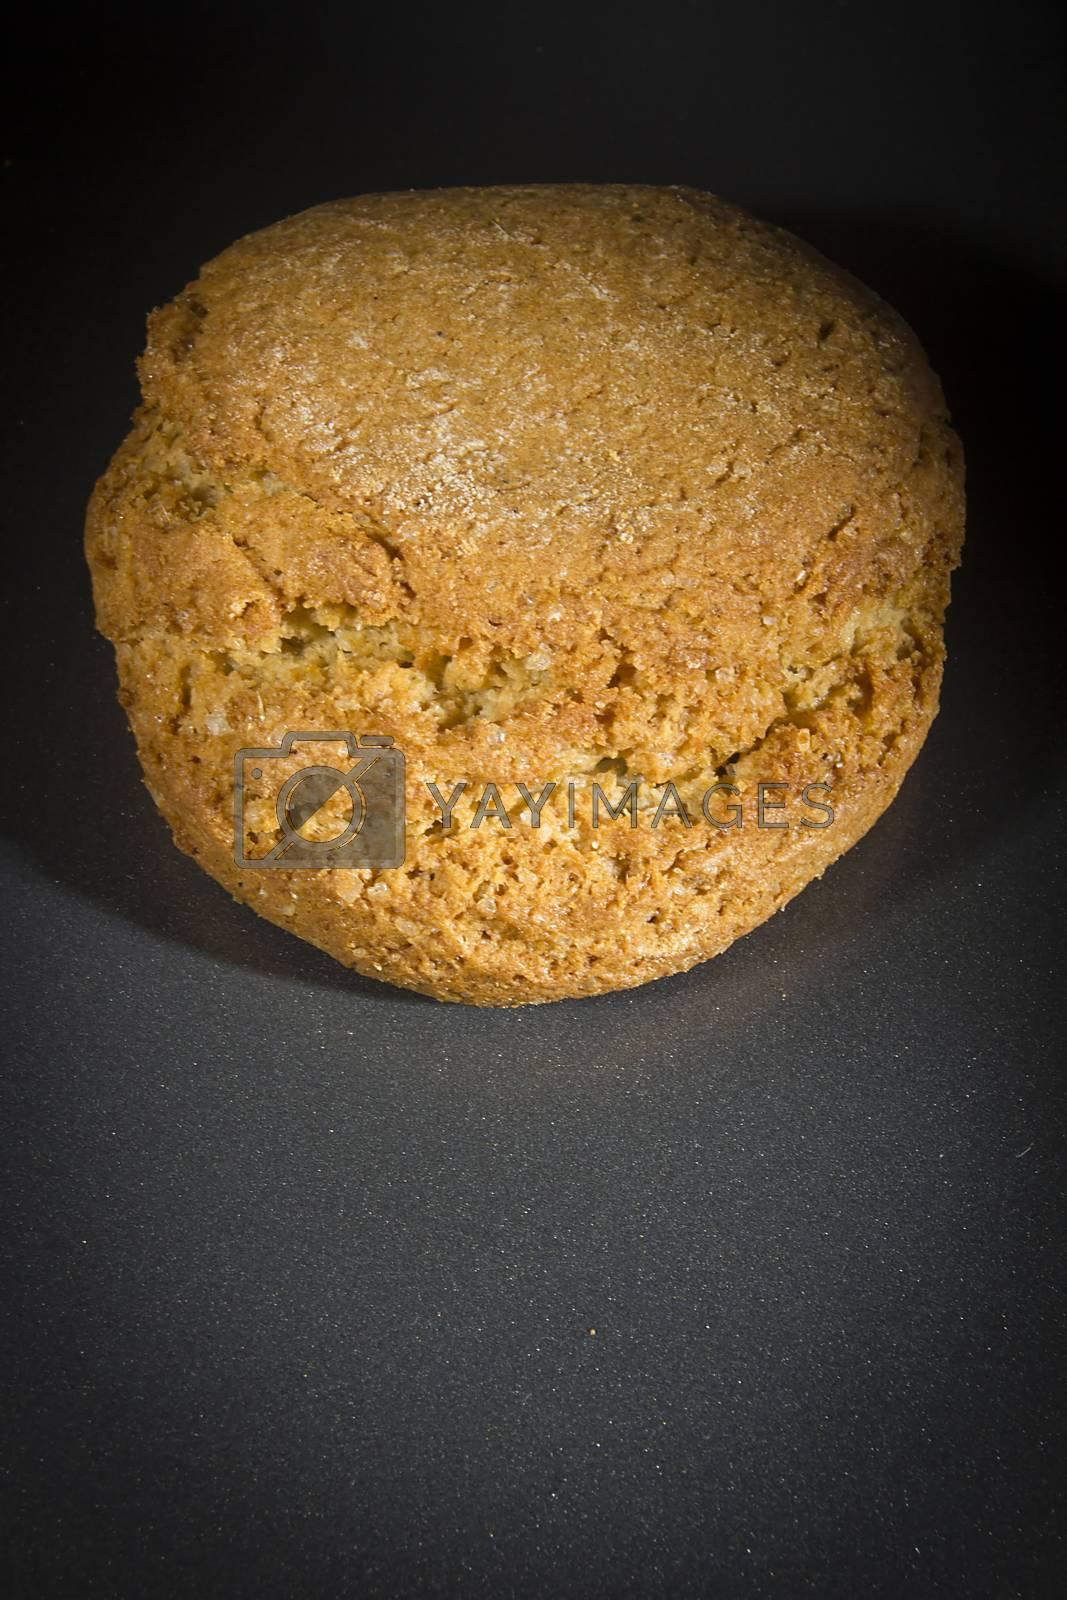 Crispy oatmeal cookies on a black background